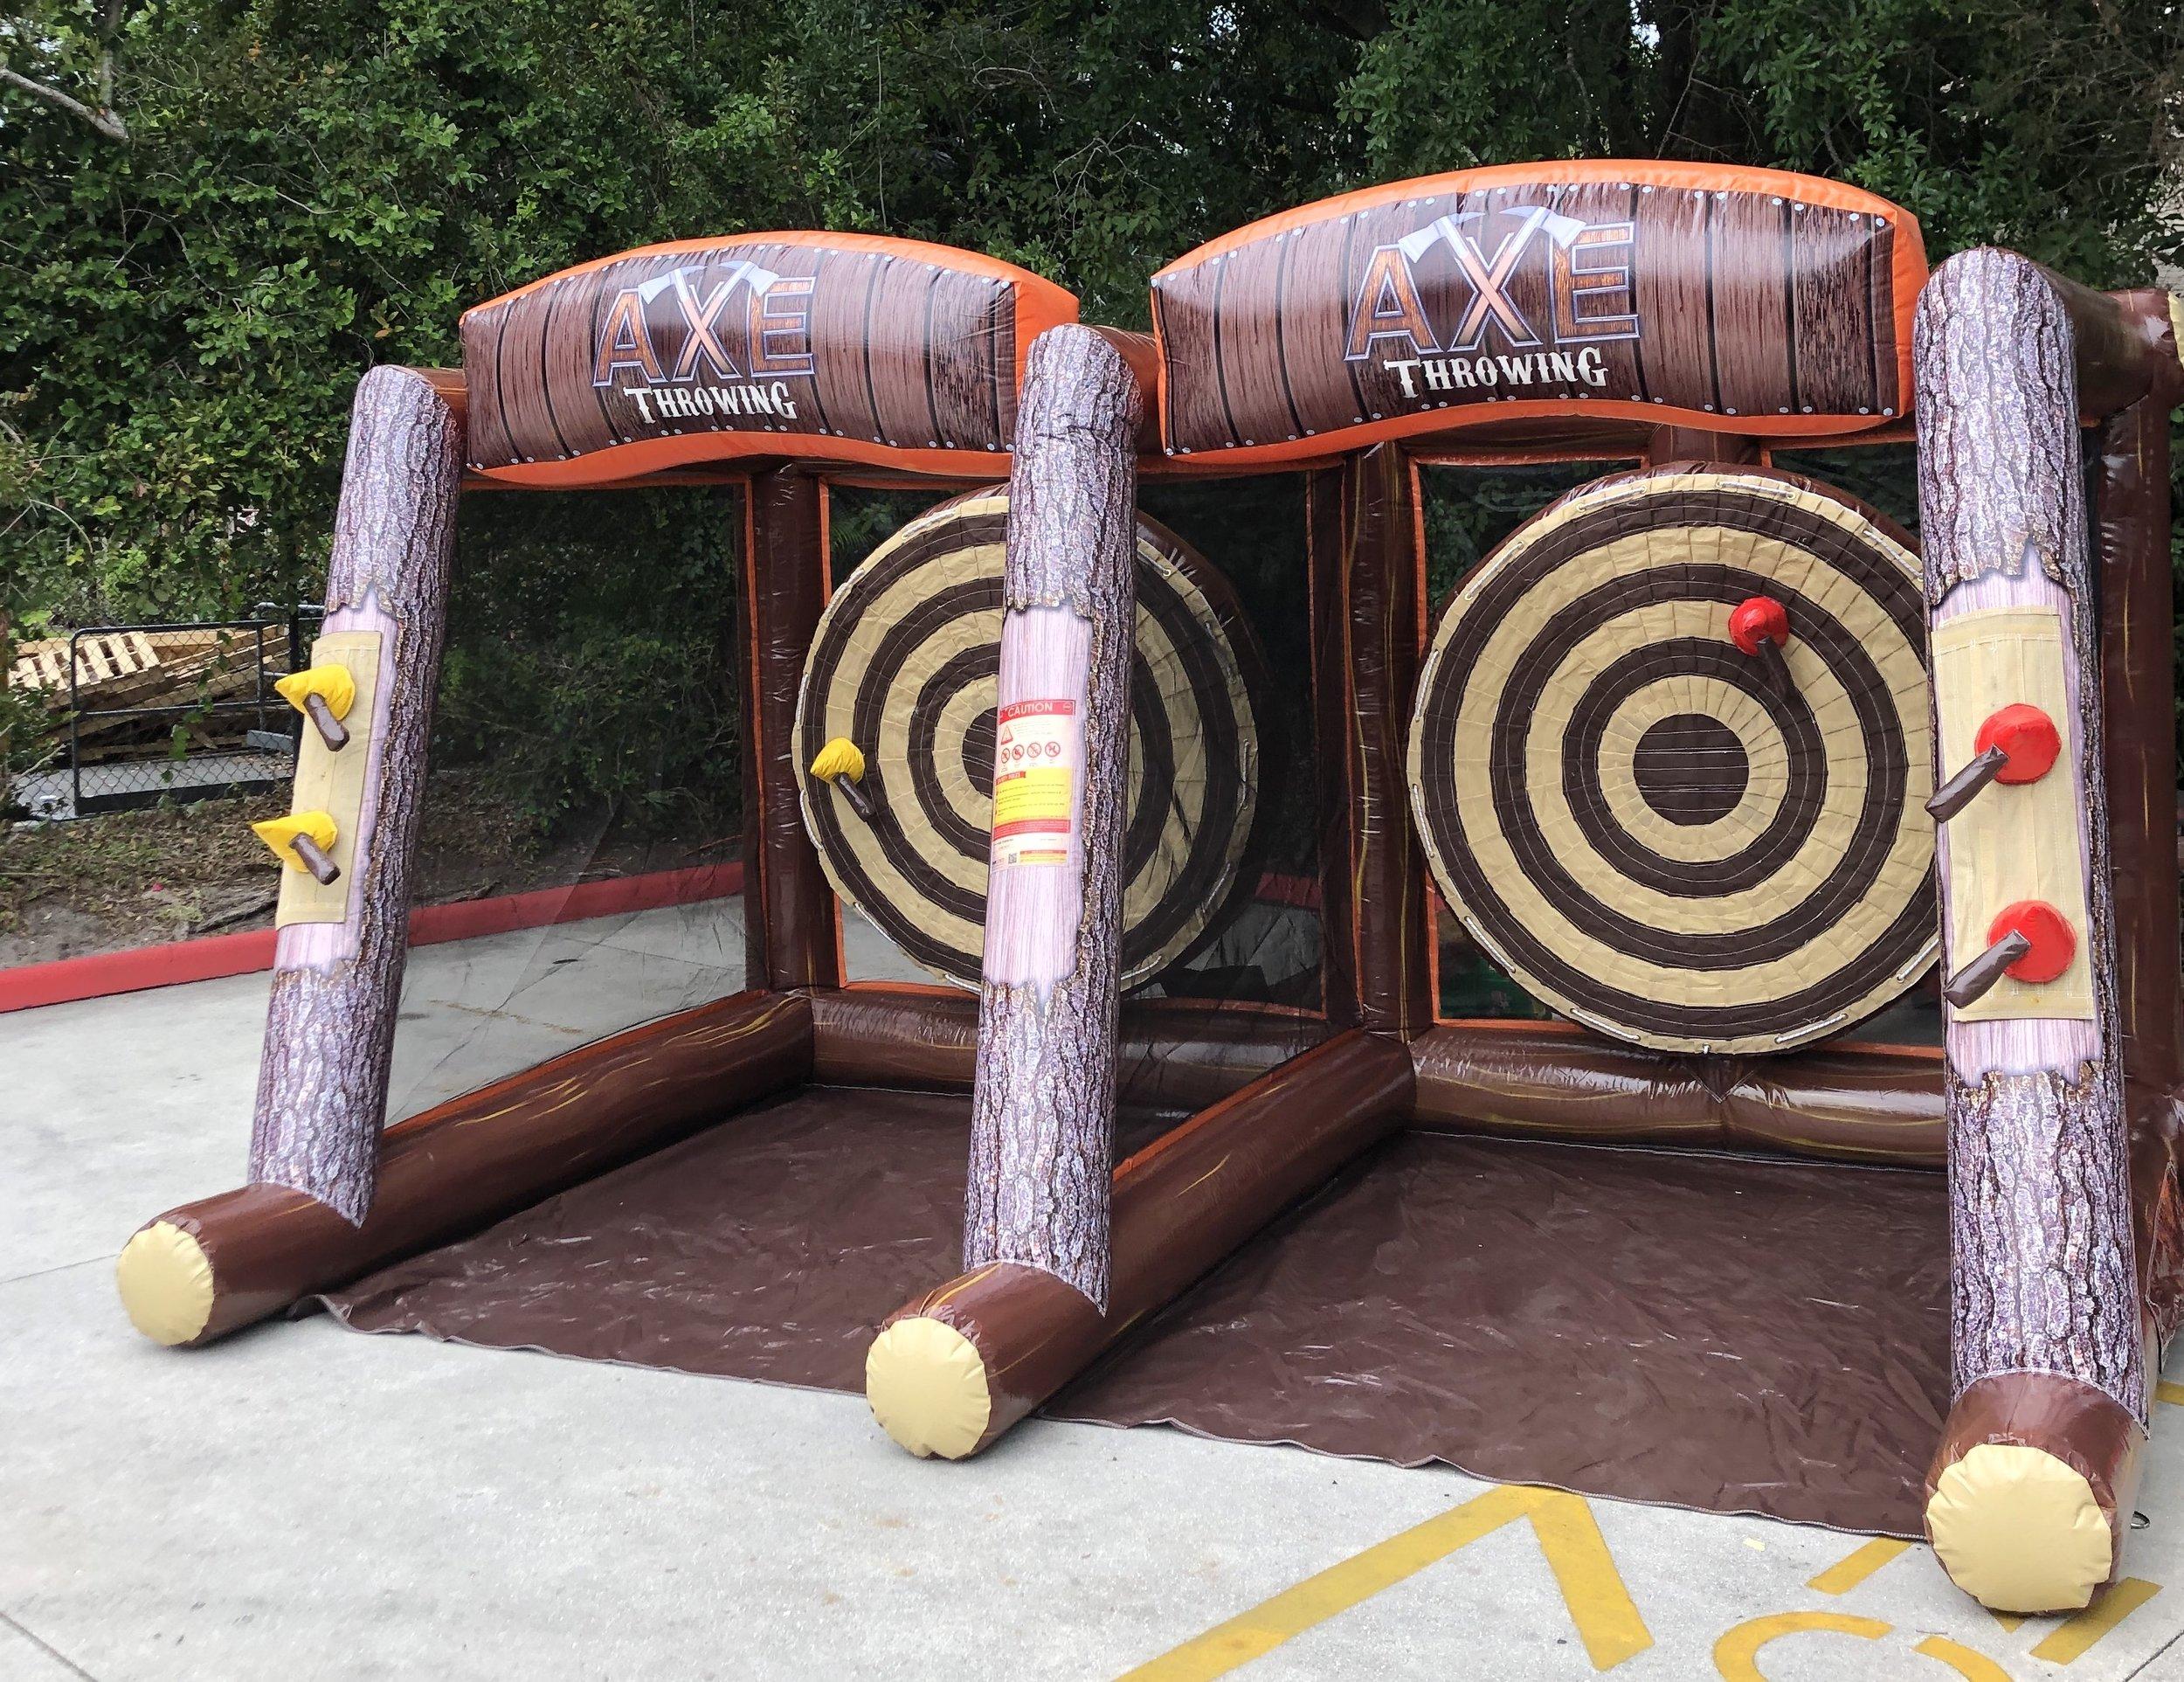 axethrowing-lumberjack-stuart-portstlucie-wpb-singerisland-royalpalmbeachphotobooth.jpg